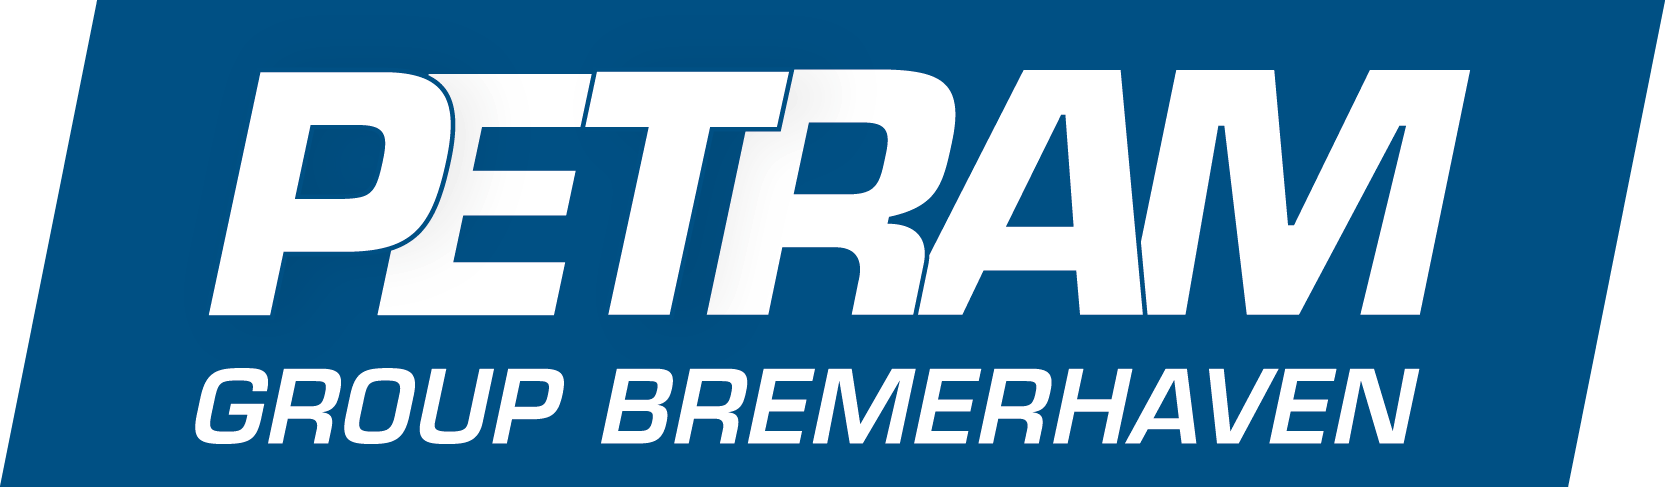 Willkommen bei der Petram Group Bremerhaven – www.petram.de